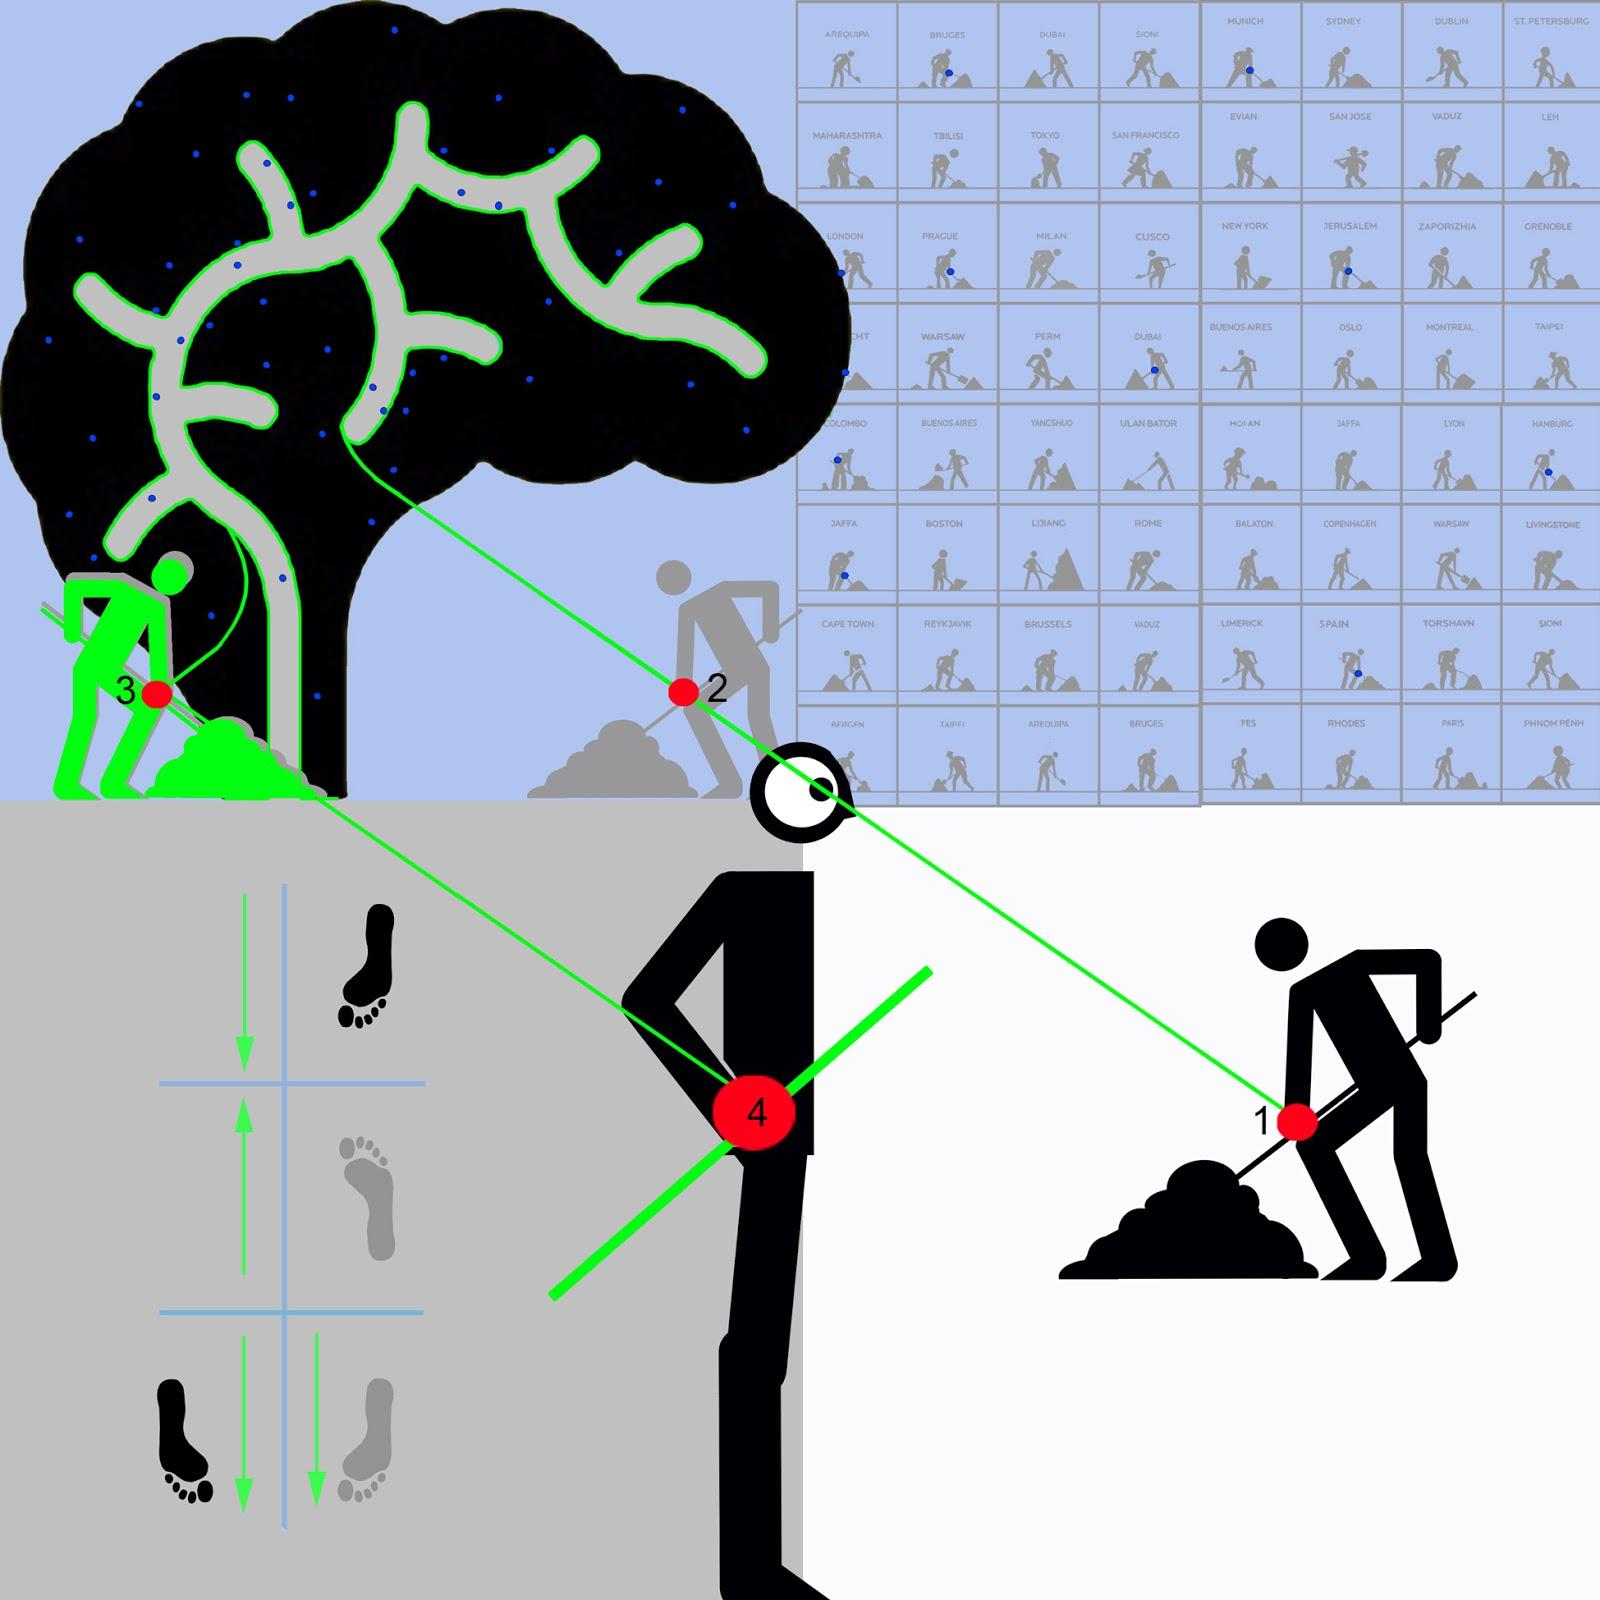 neuronas espejo, pictogramas, isotipos